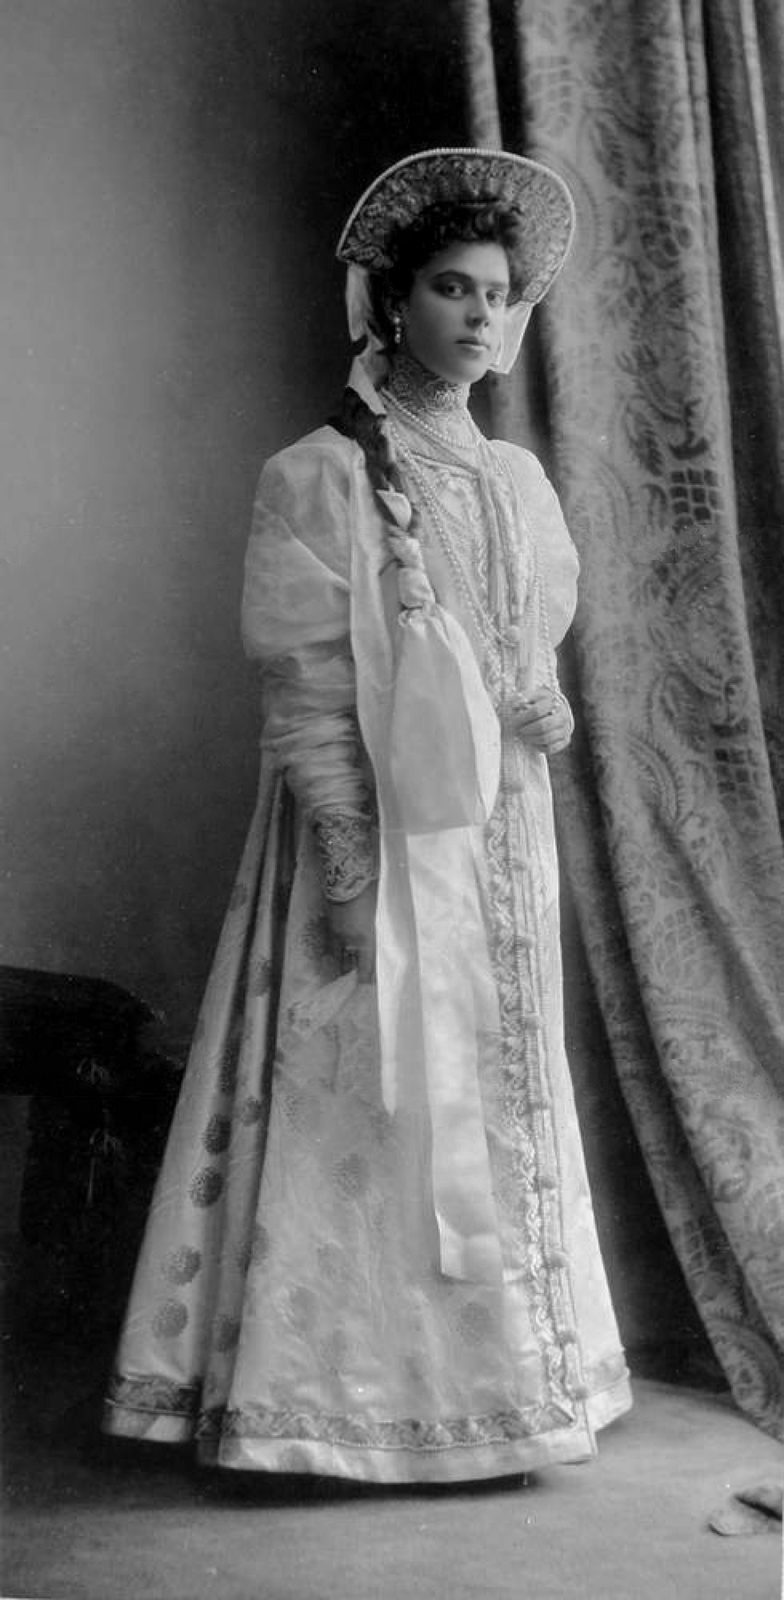 Countess Vera Sergeevna Witte in the costume of the boyarynya of the XVII century.